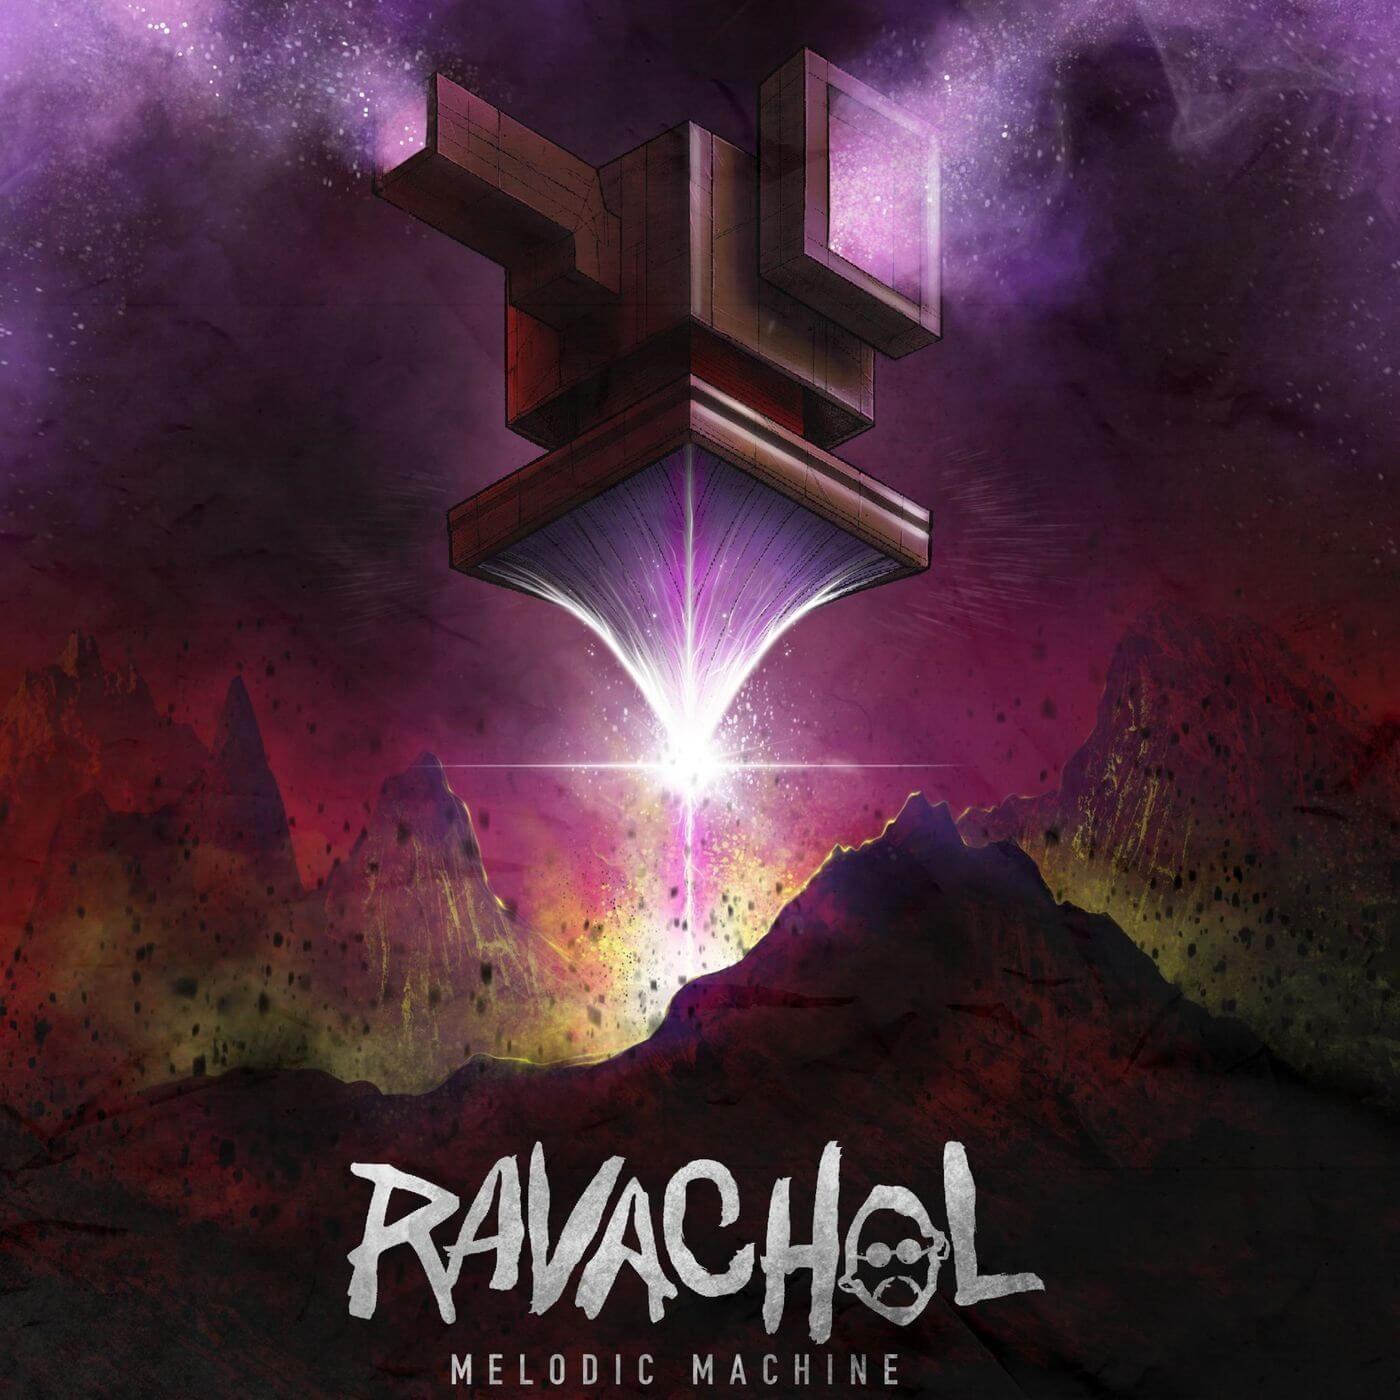 ravachol melodic machine